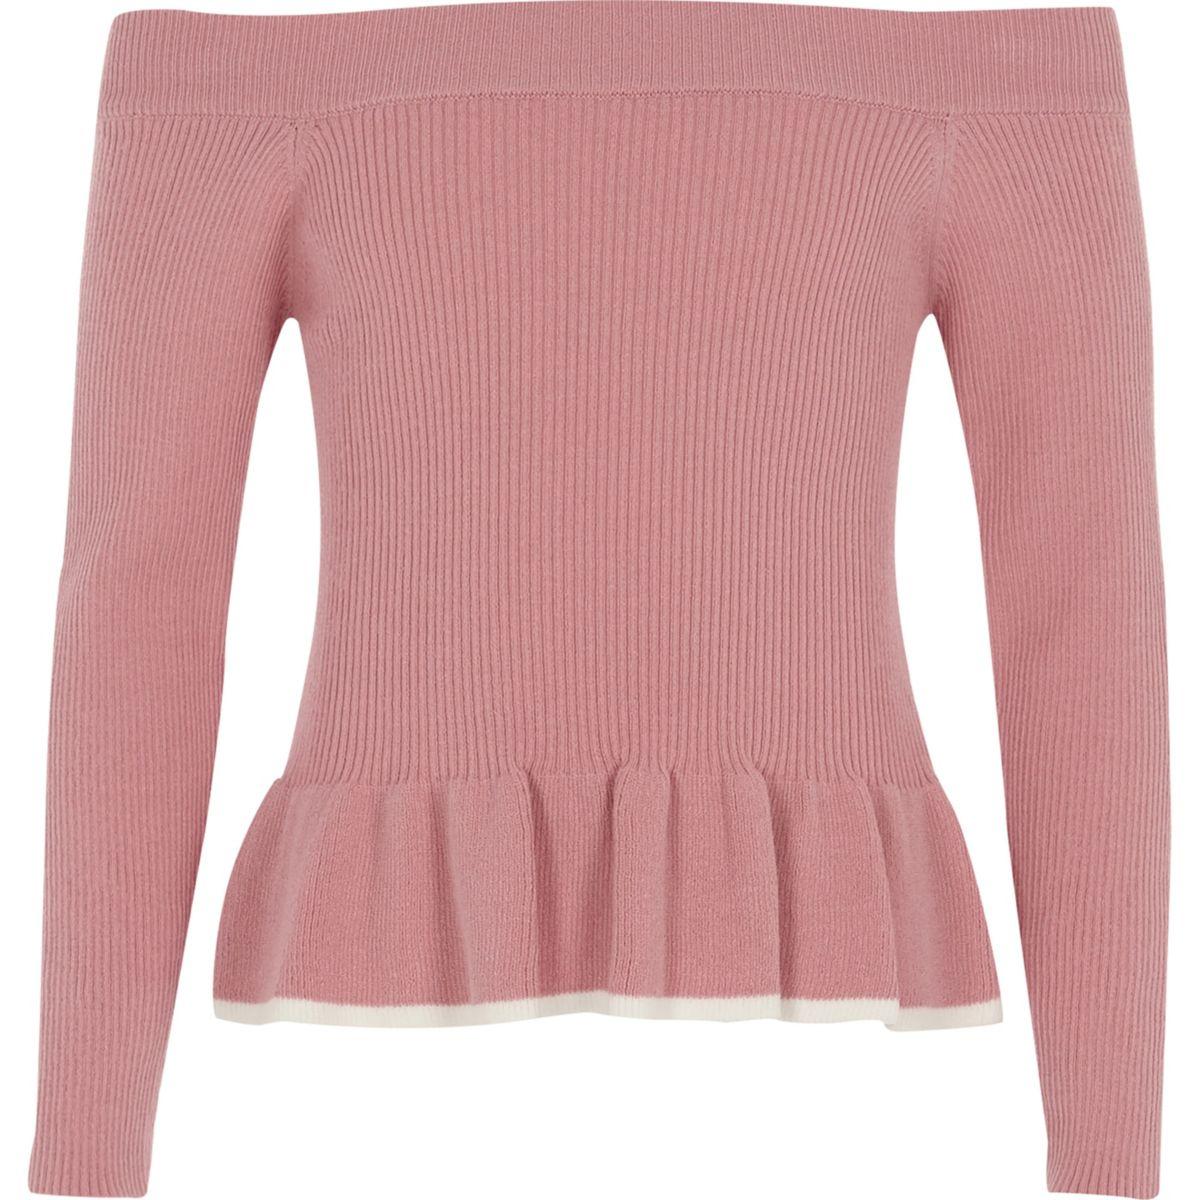 Girls pink bardot peplum hem top